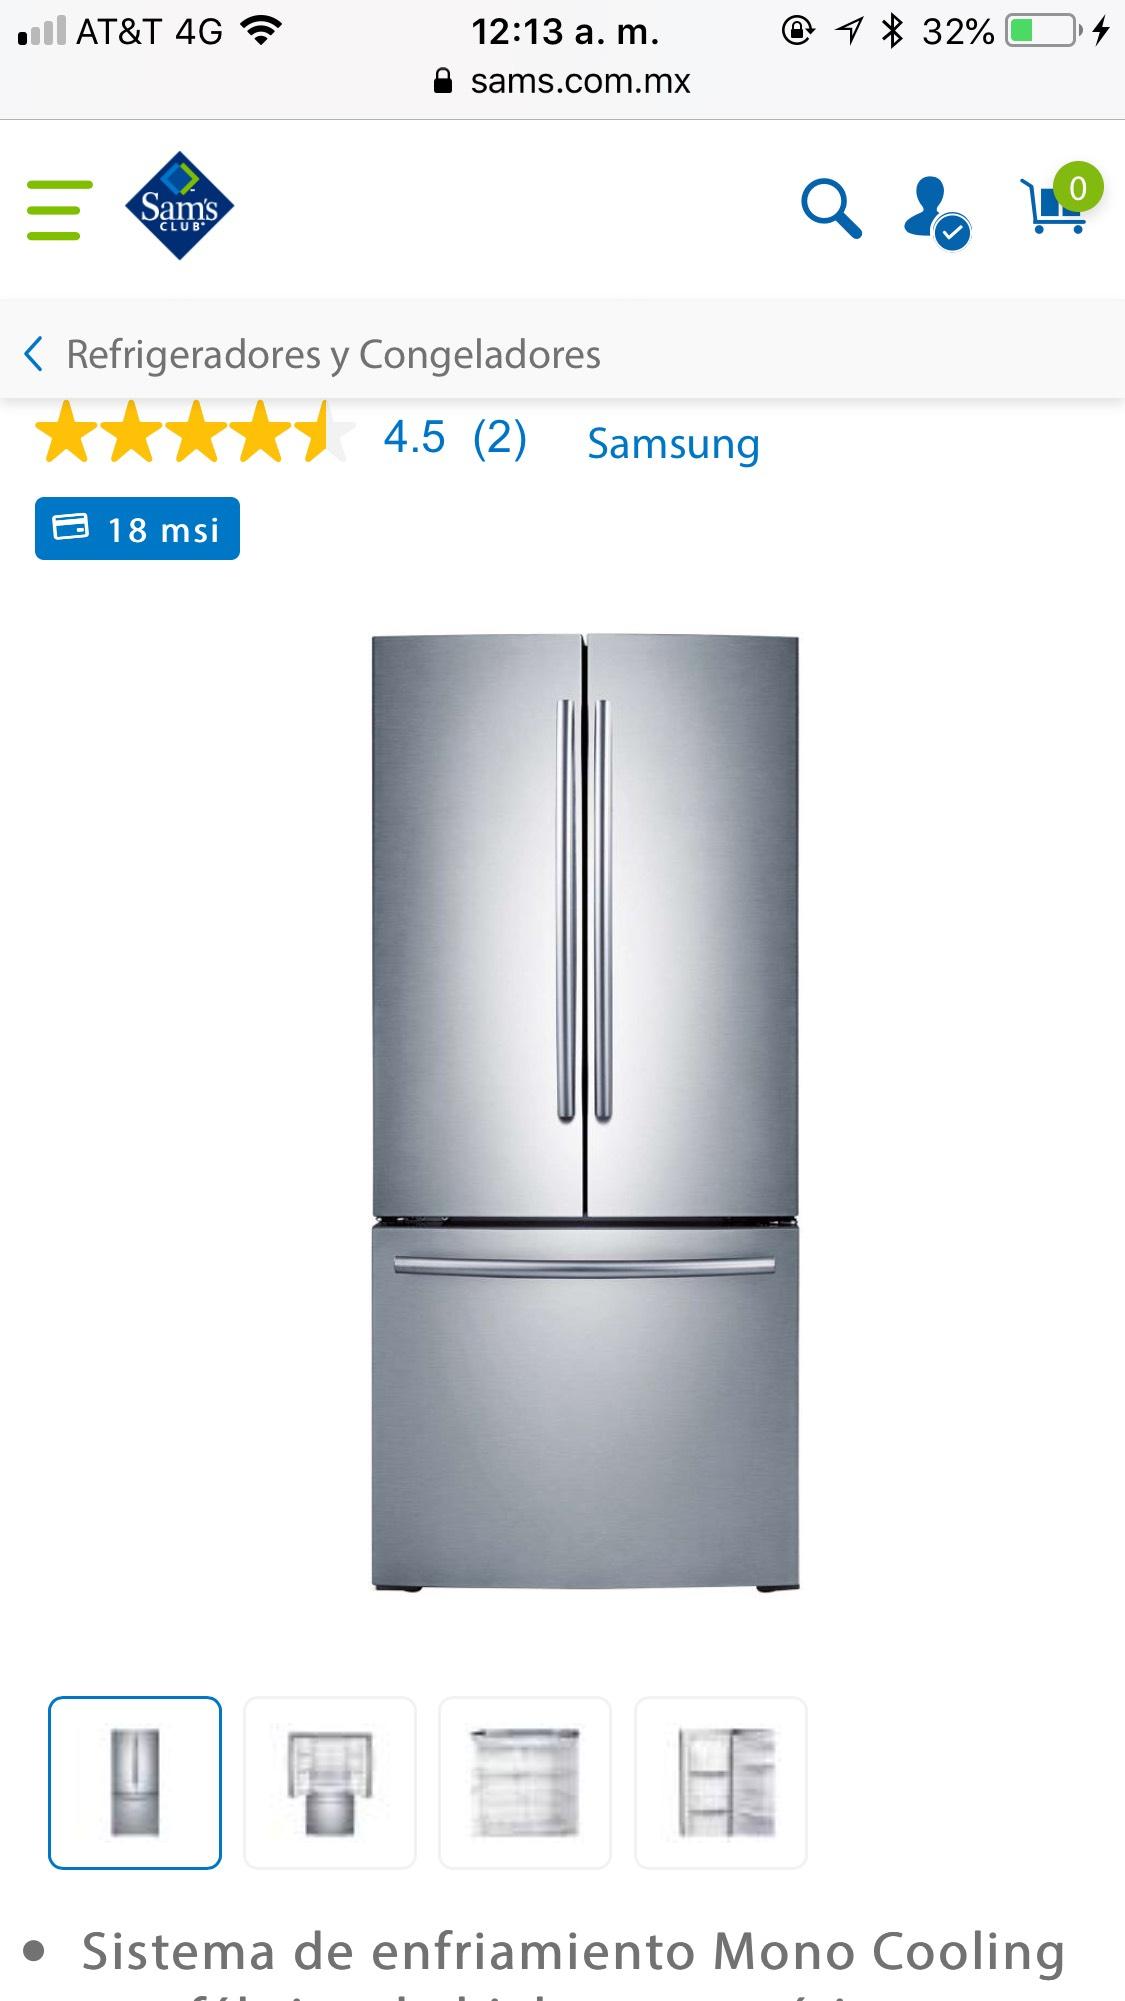 Sam's Club: Refrigerador Samsung French Door 22 Pies Cúbicos